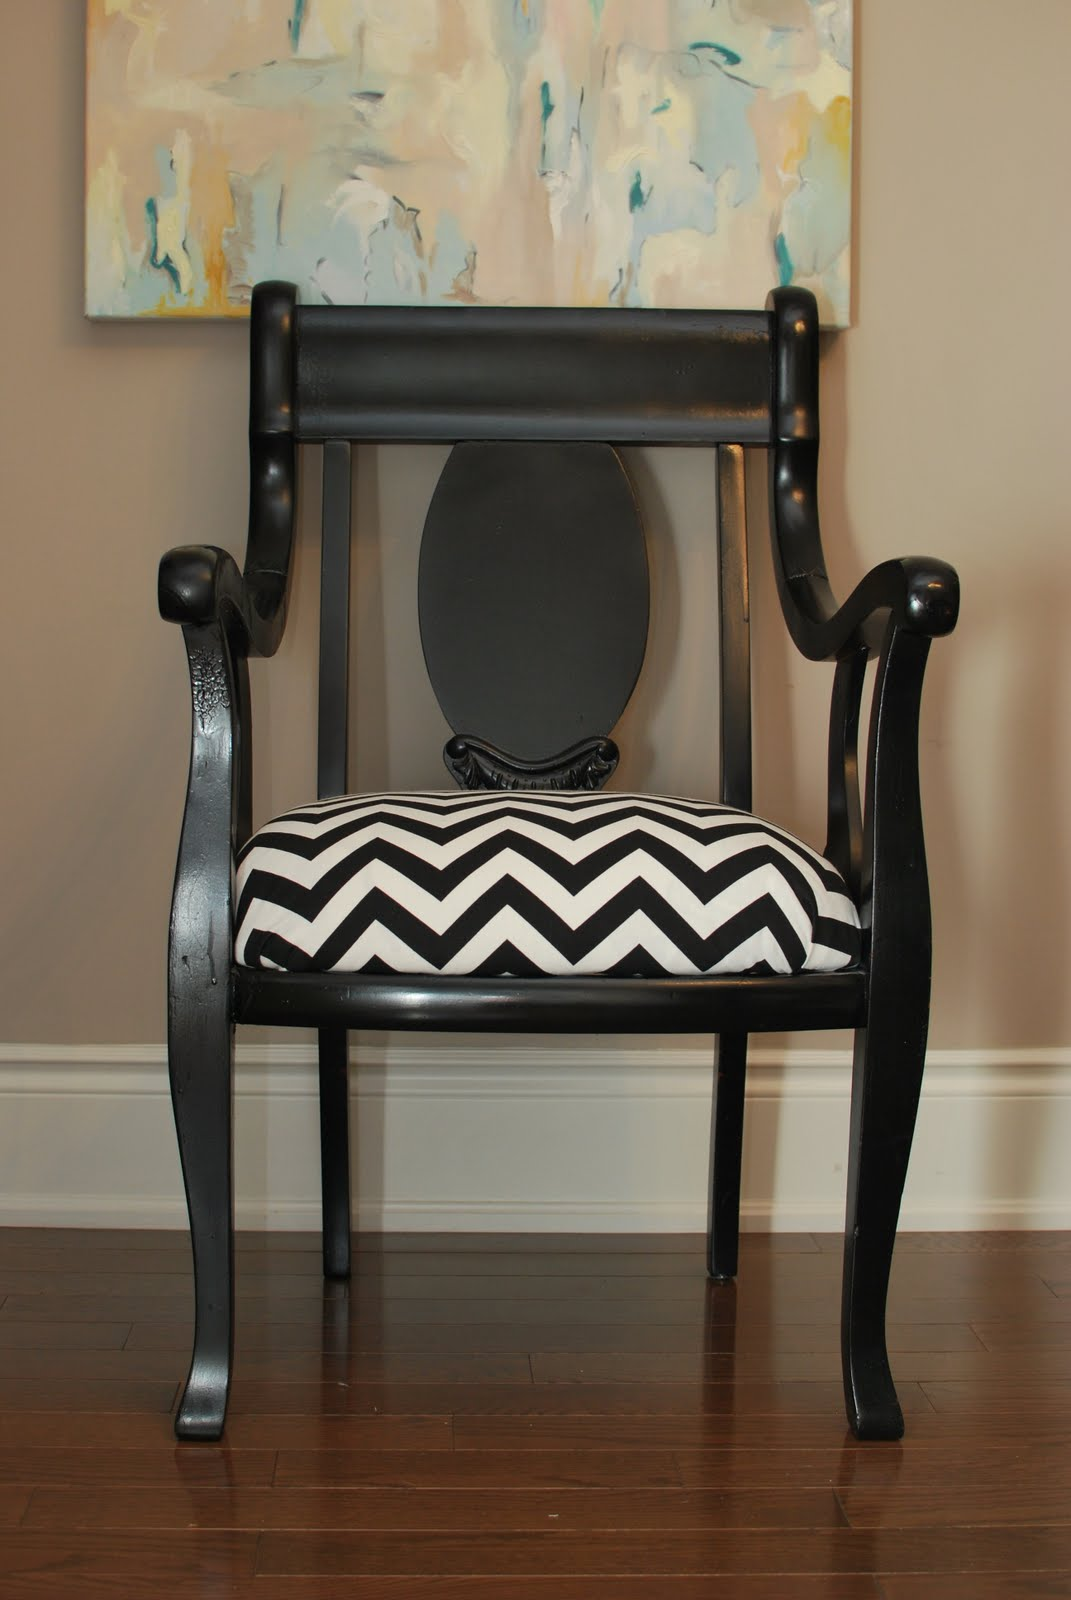 https://i1.wp.com/4.bp.blogspot.com/_Cq9ZHL9A6G0/THL0-mdhiRI/AAAAAAAAE04/uUITKsZ7peo/s1600/diy+chair+030.JPG?resize=356%2C533